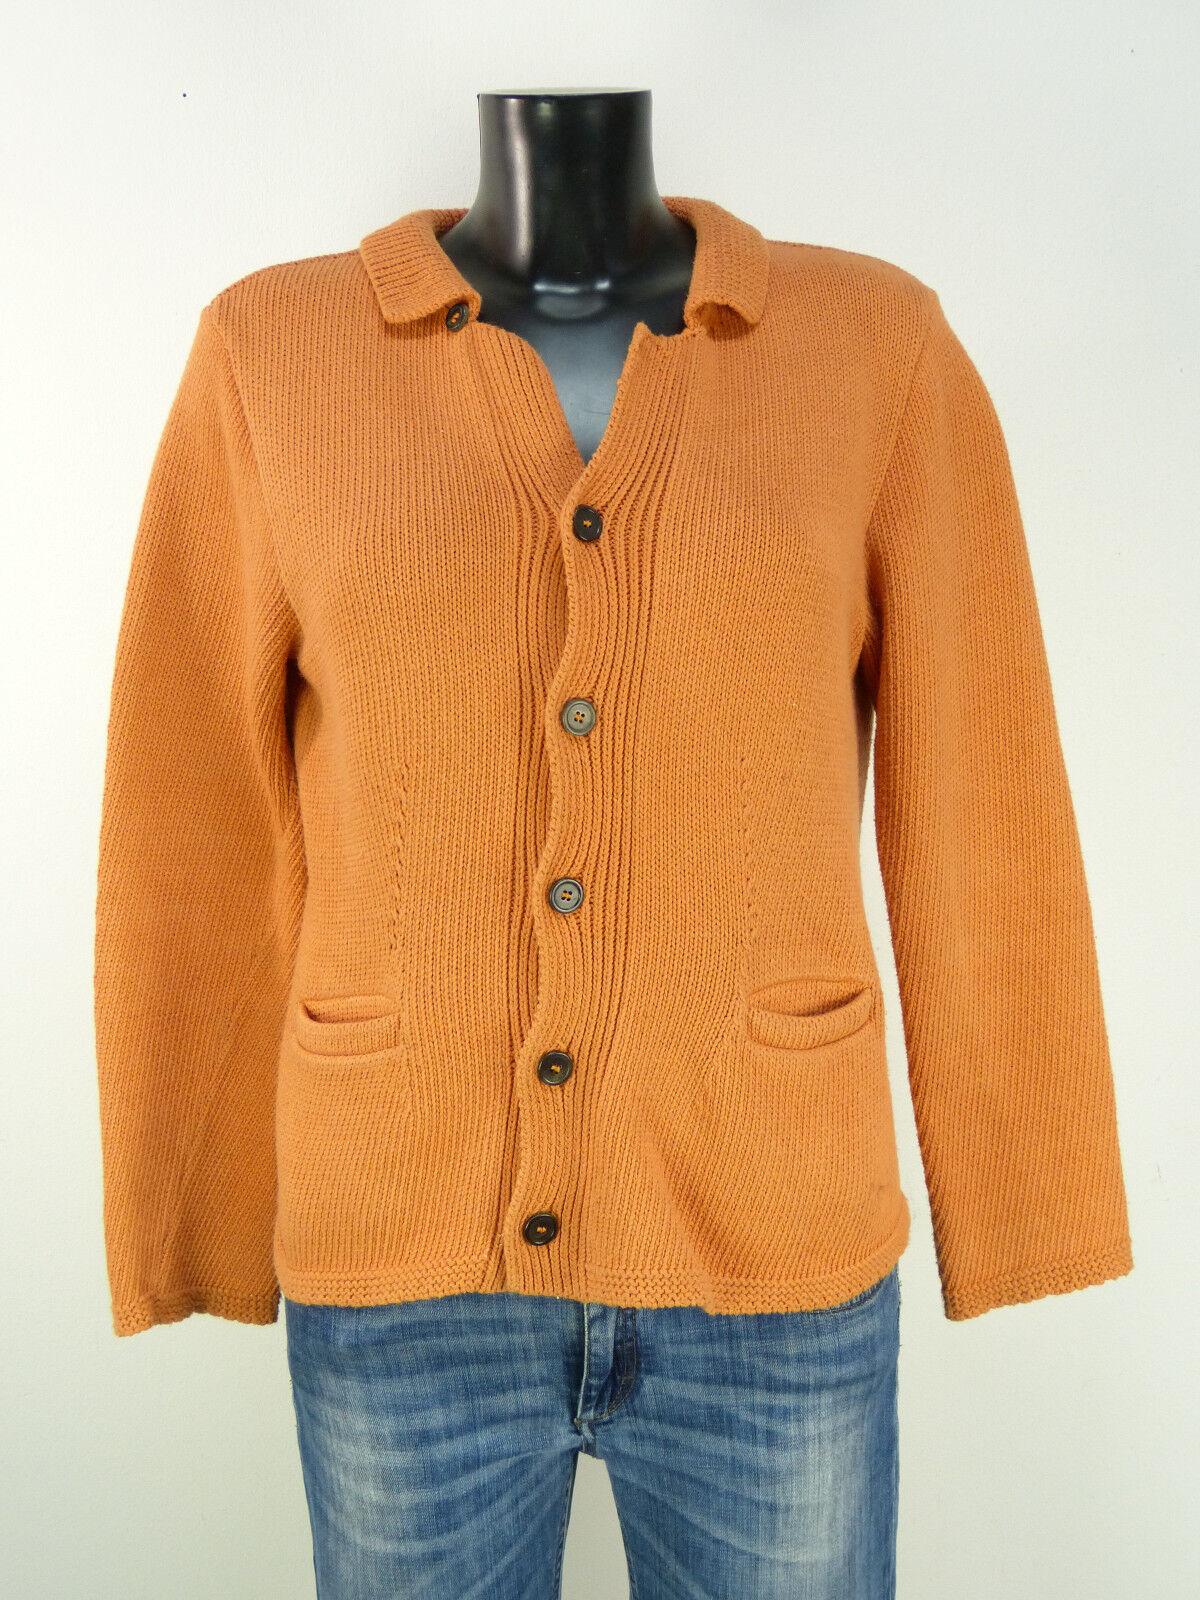 Omen Cardigan Donna Taglia M-DE Arancione & 100% COTONE (P (P (P 5598 R) fab64c